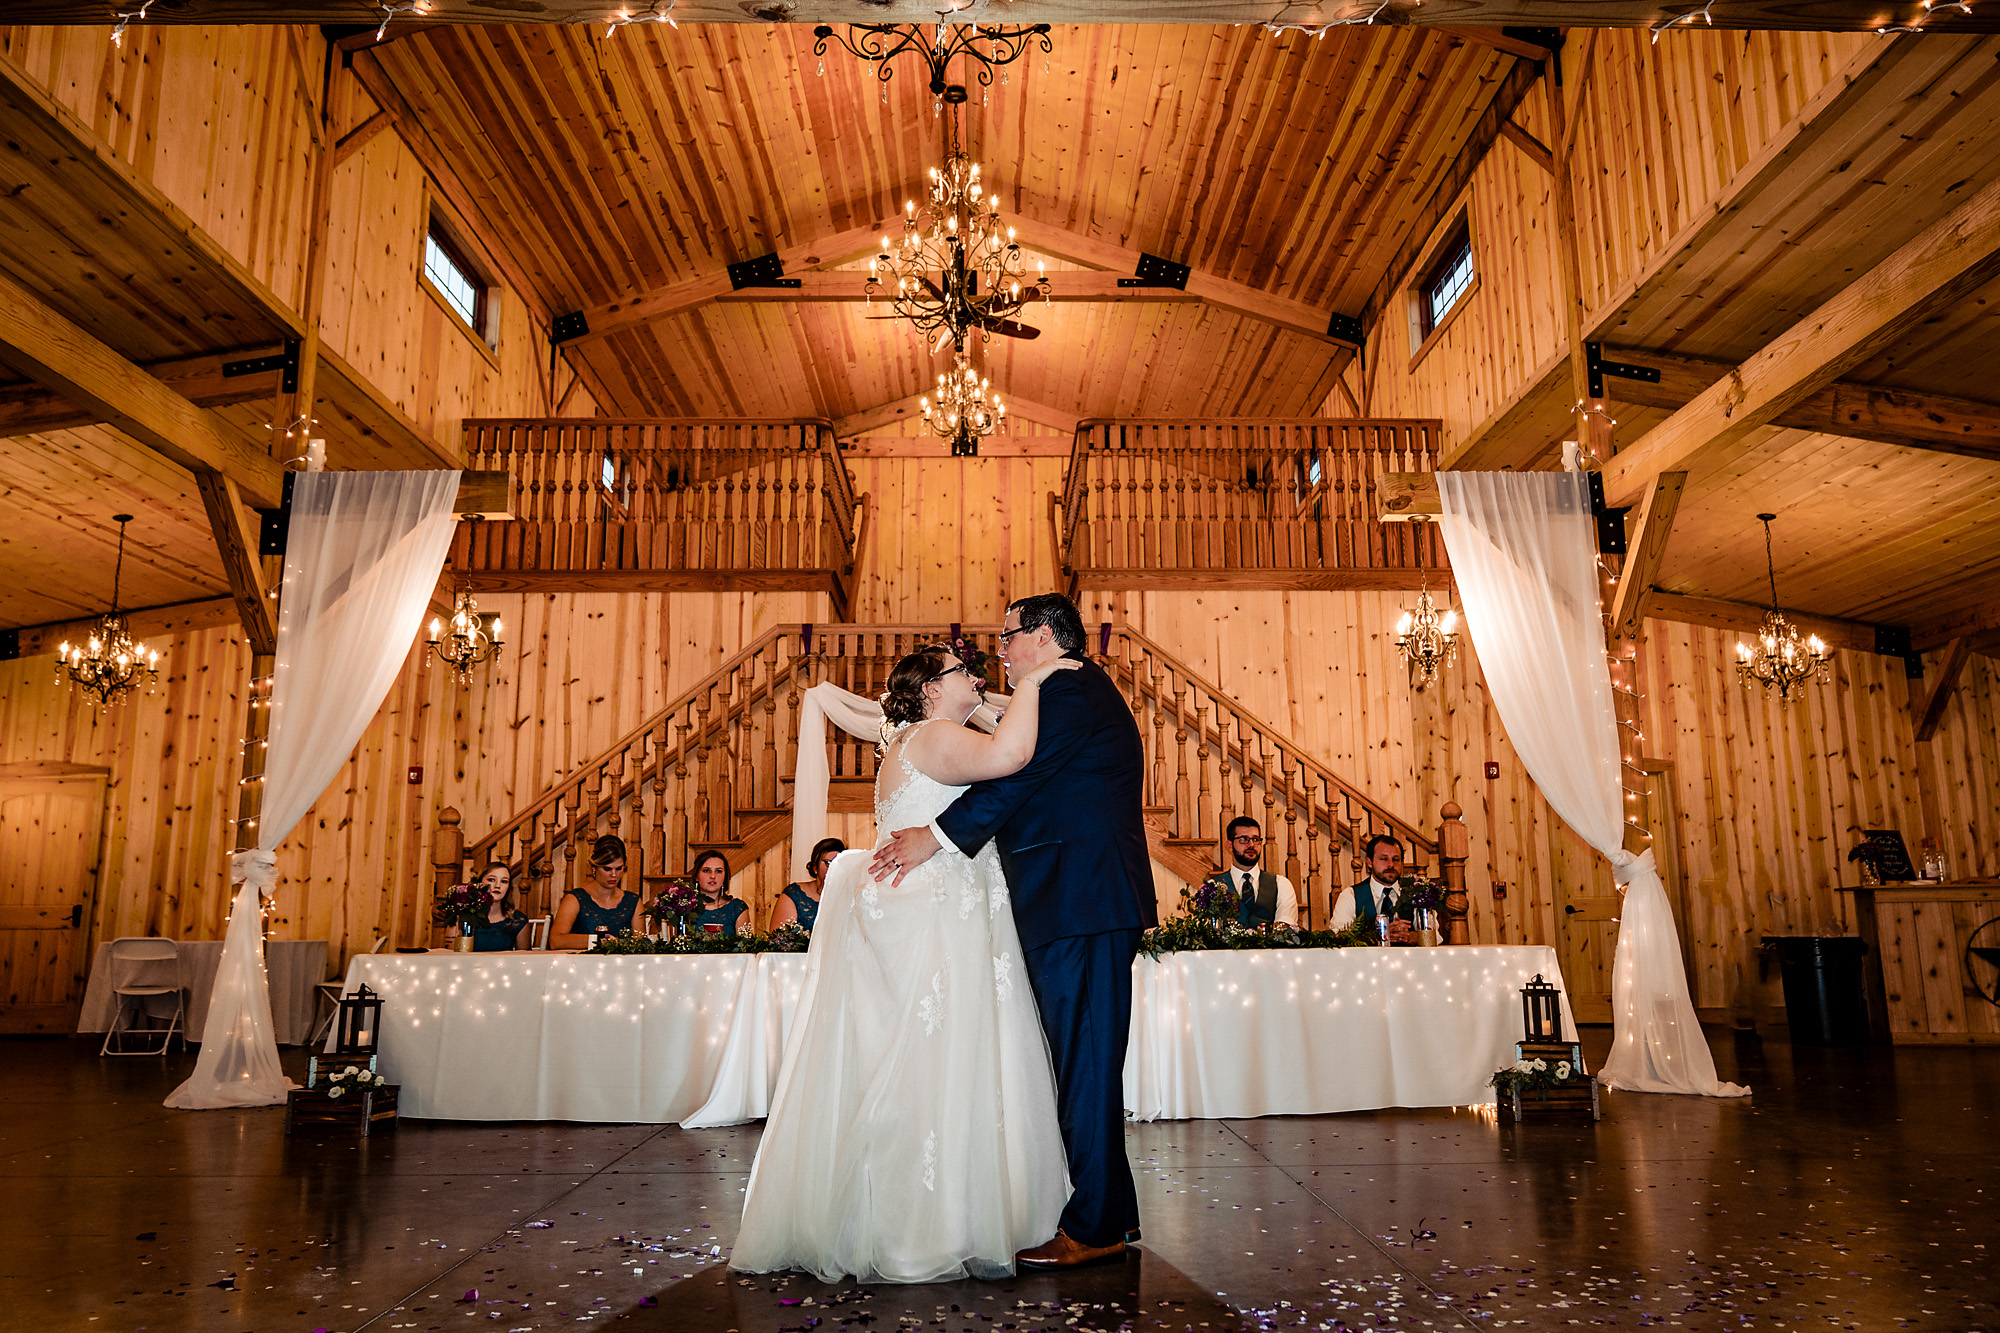 Silver-Creek-Stables-Wedding-Photography-19.jpg